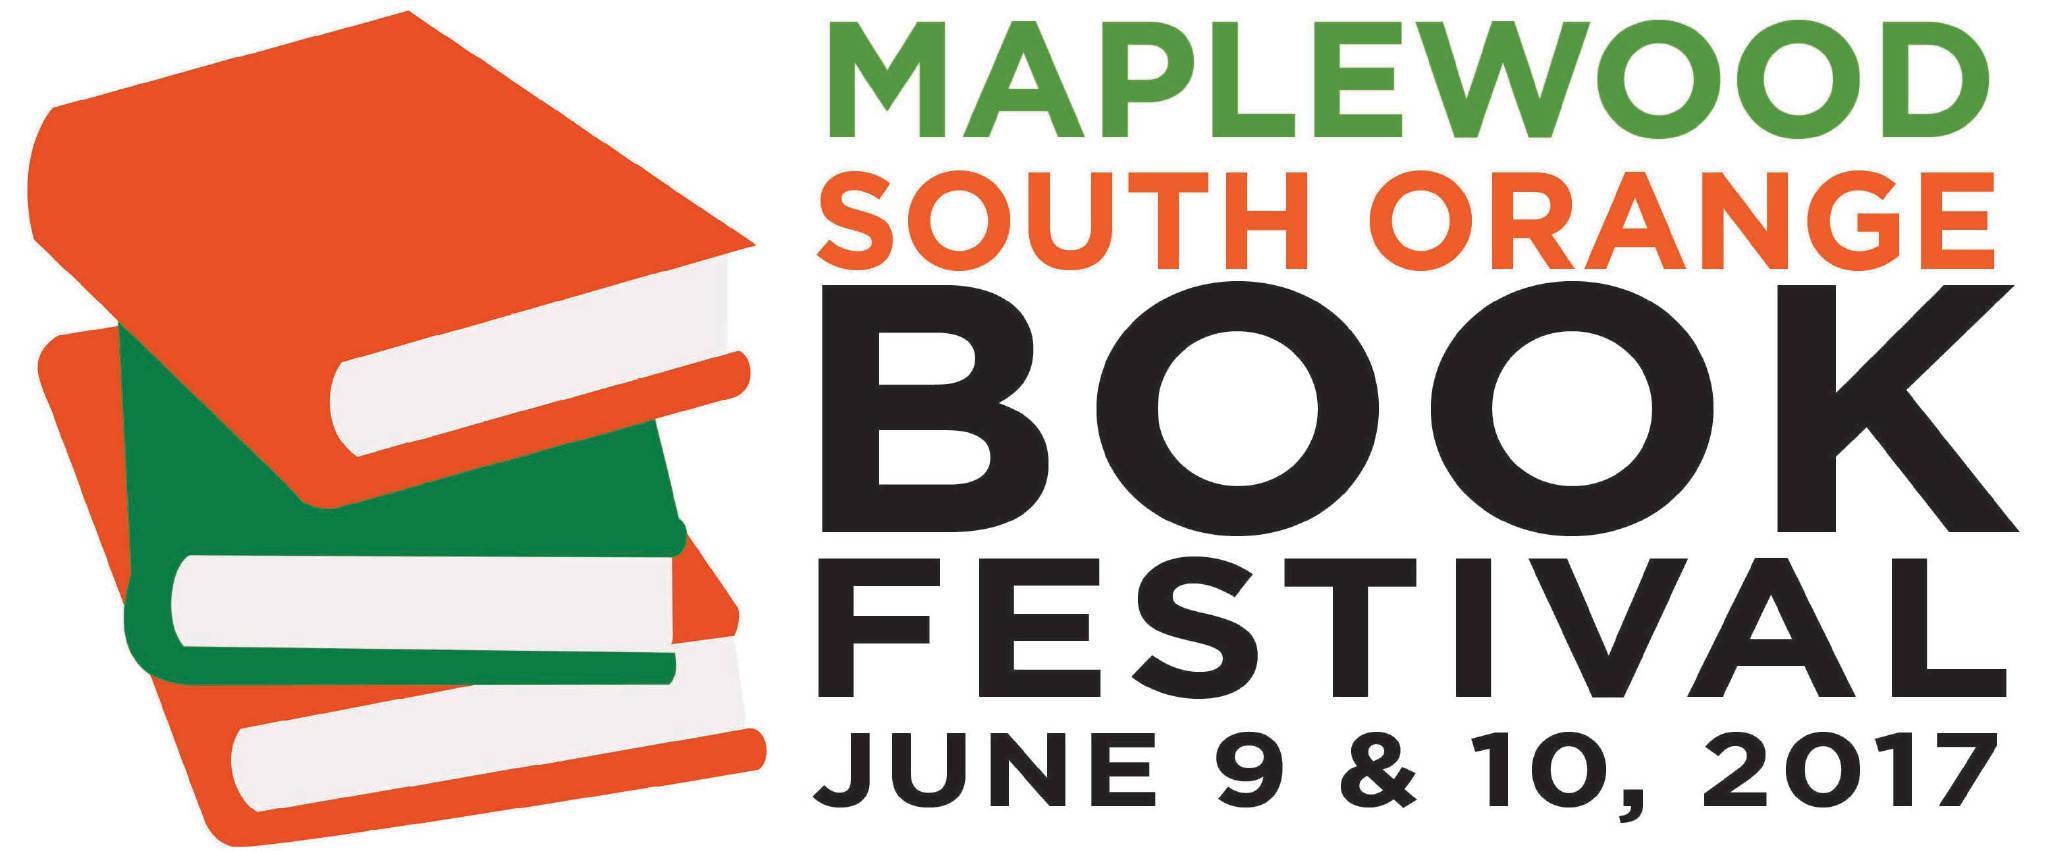 85e7aaf5d9c1b1920e41_mapso_book_festival.jpg